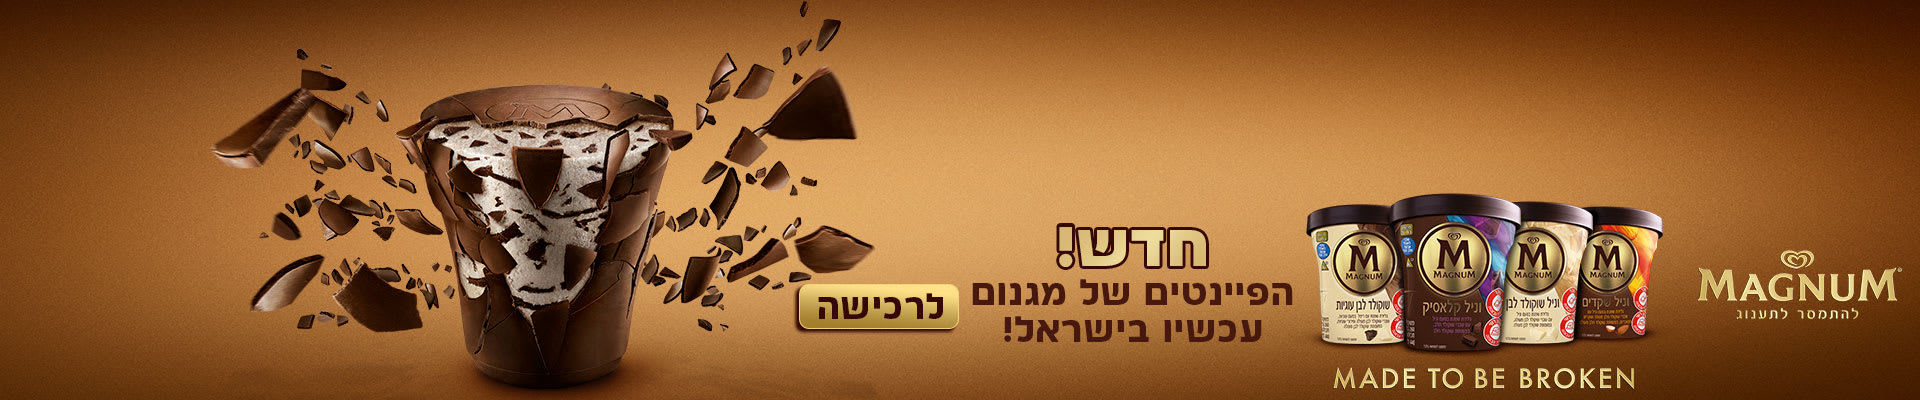 MAGNUM להתחבר לתענוג חדש! הפיינטים של מגנום עכשיו בישראל! MADE TO BE BROKEN לרכישה